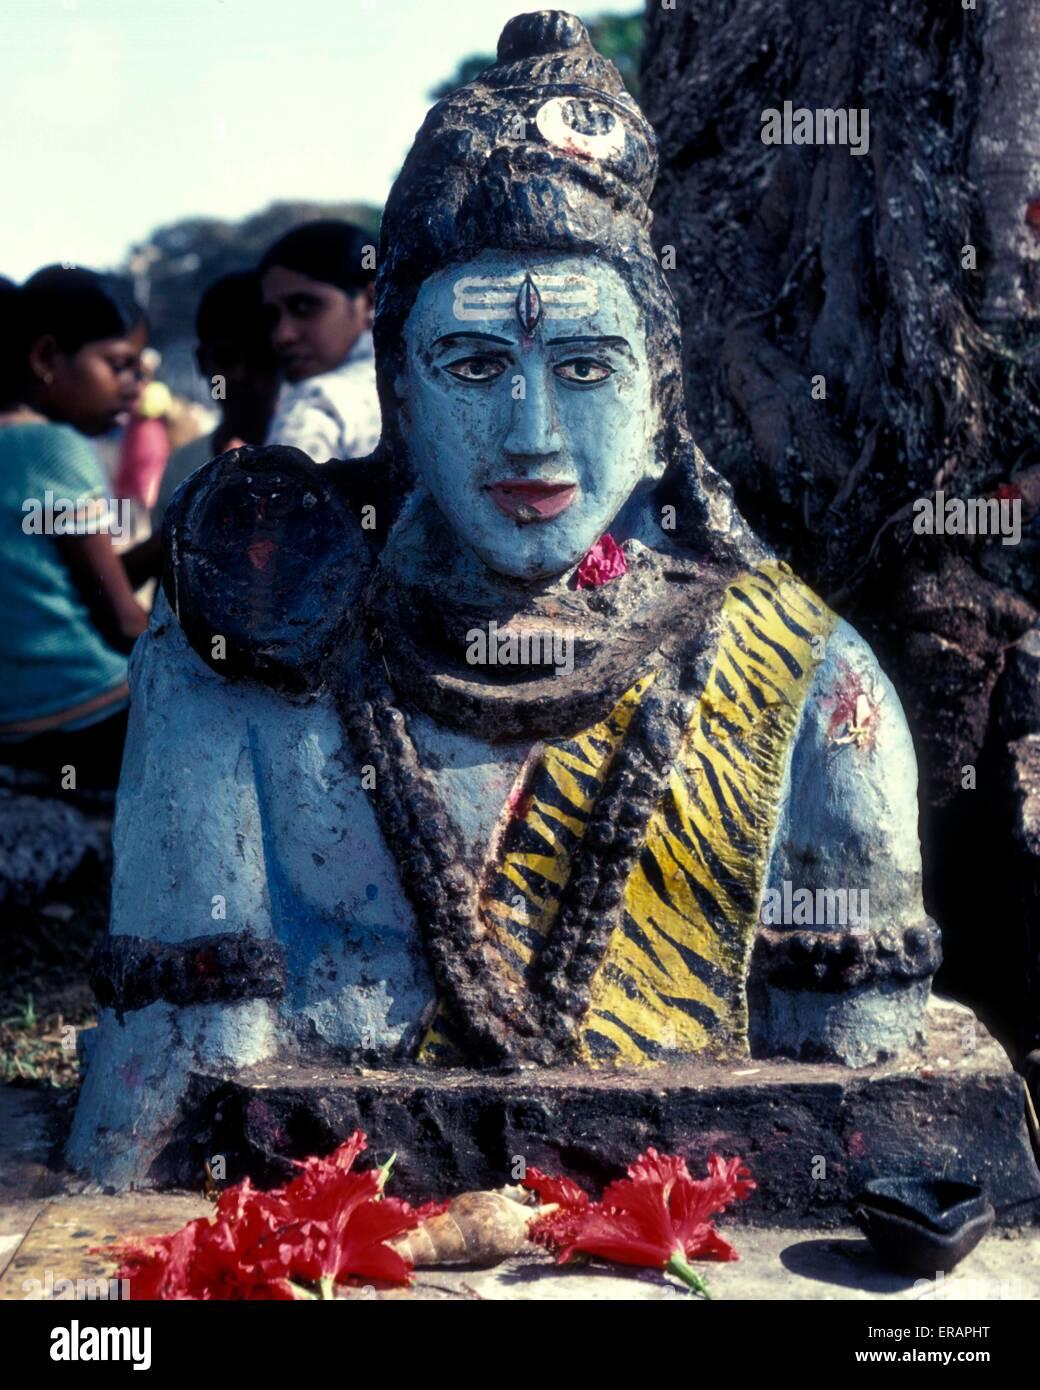 A statue of Lord Krishna on a roadside in Goa - Stock Image